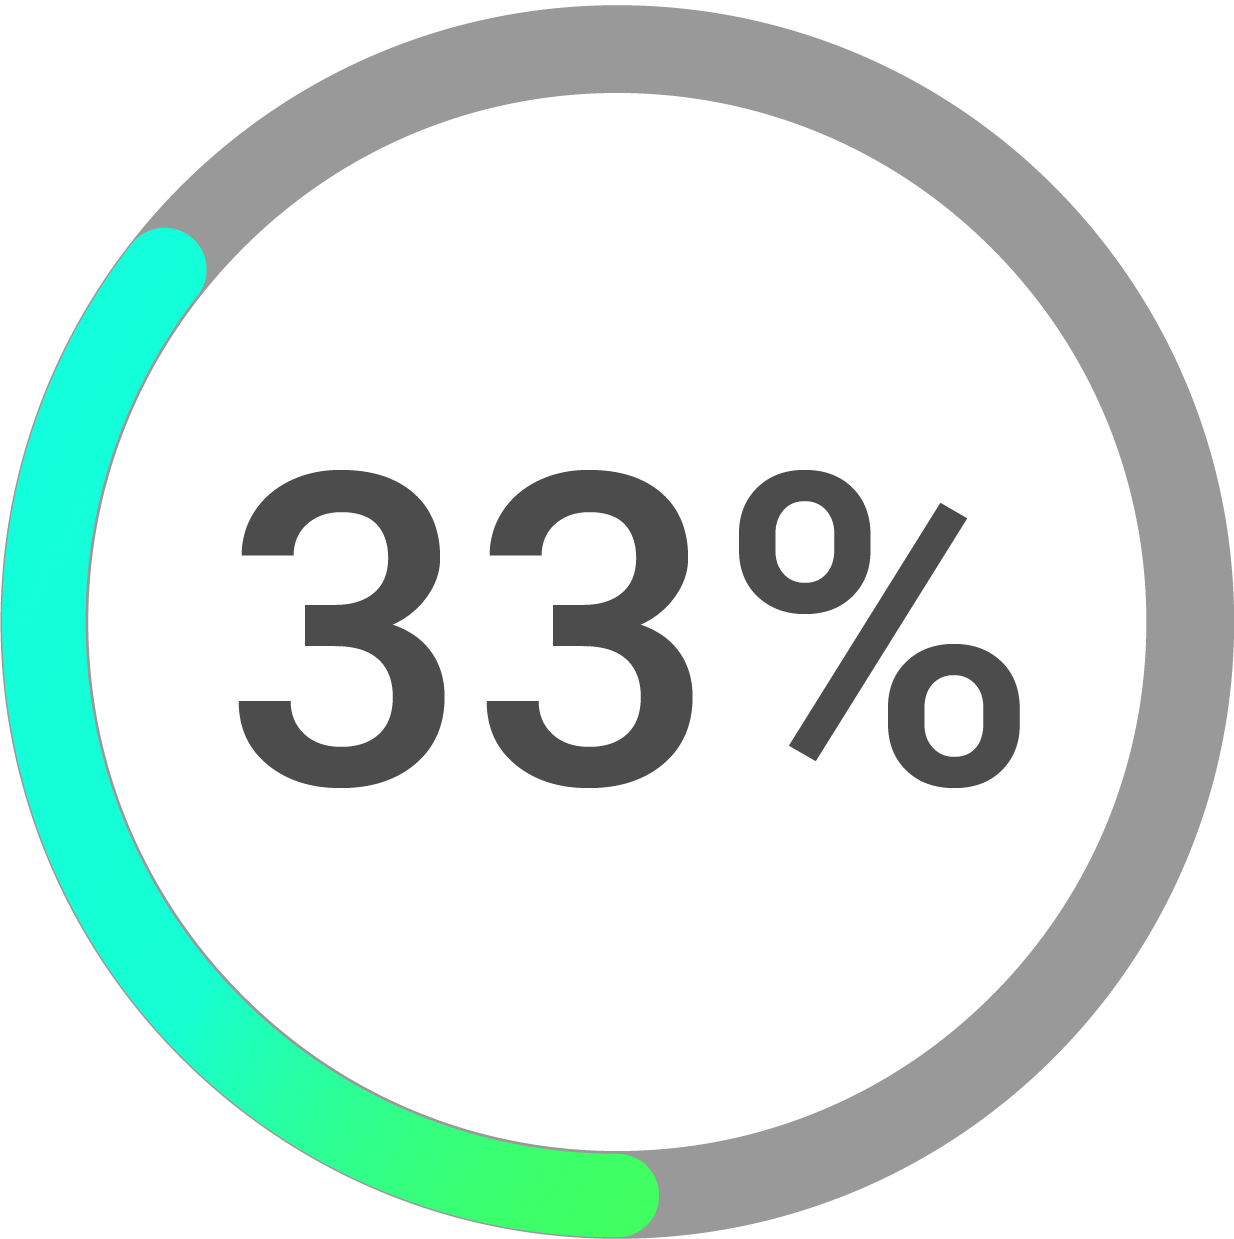 Circle progress icon percentage 33